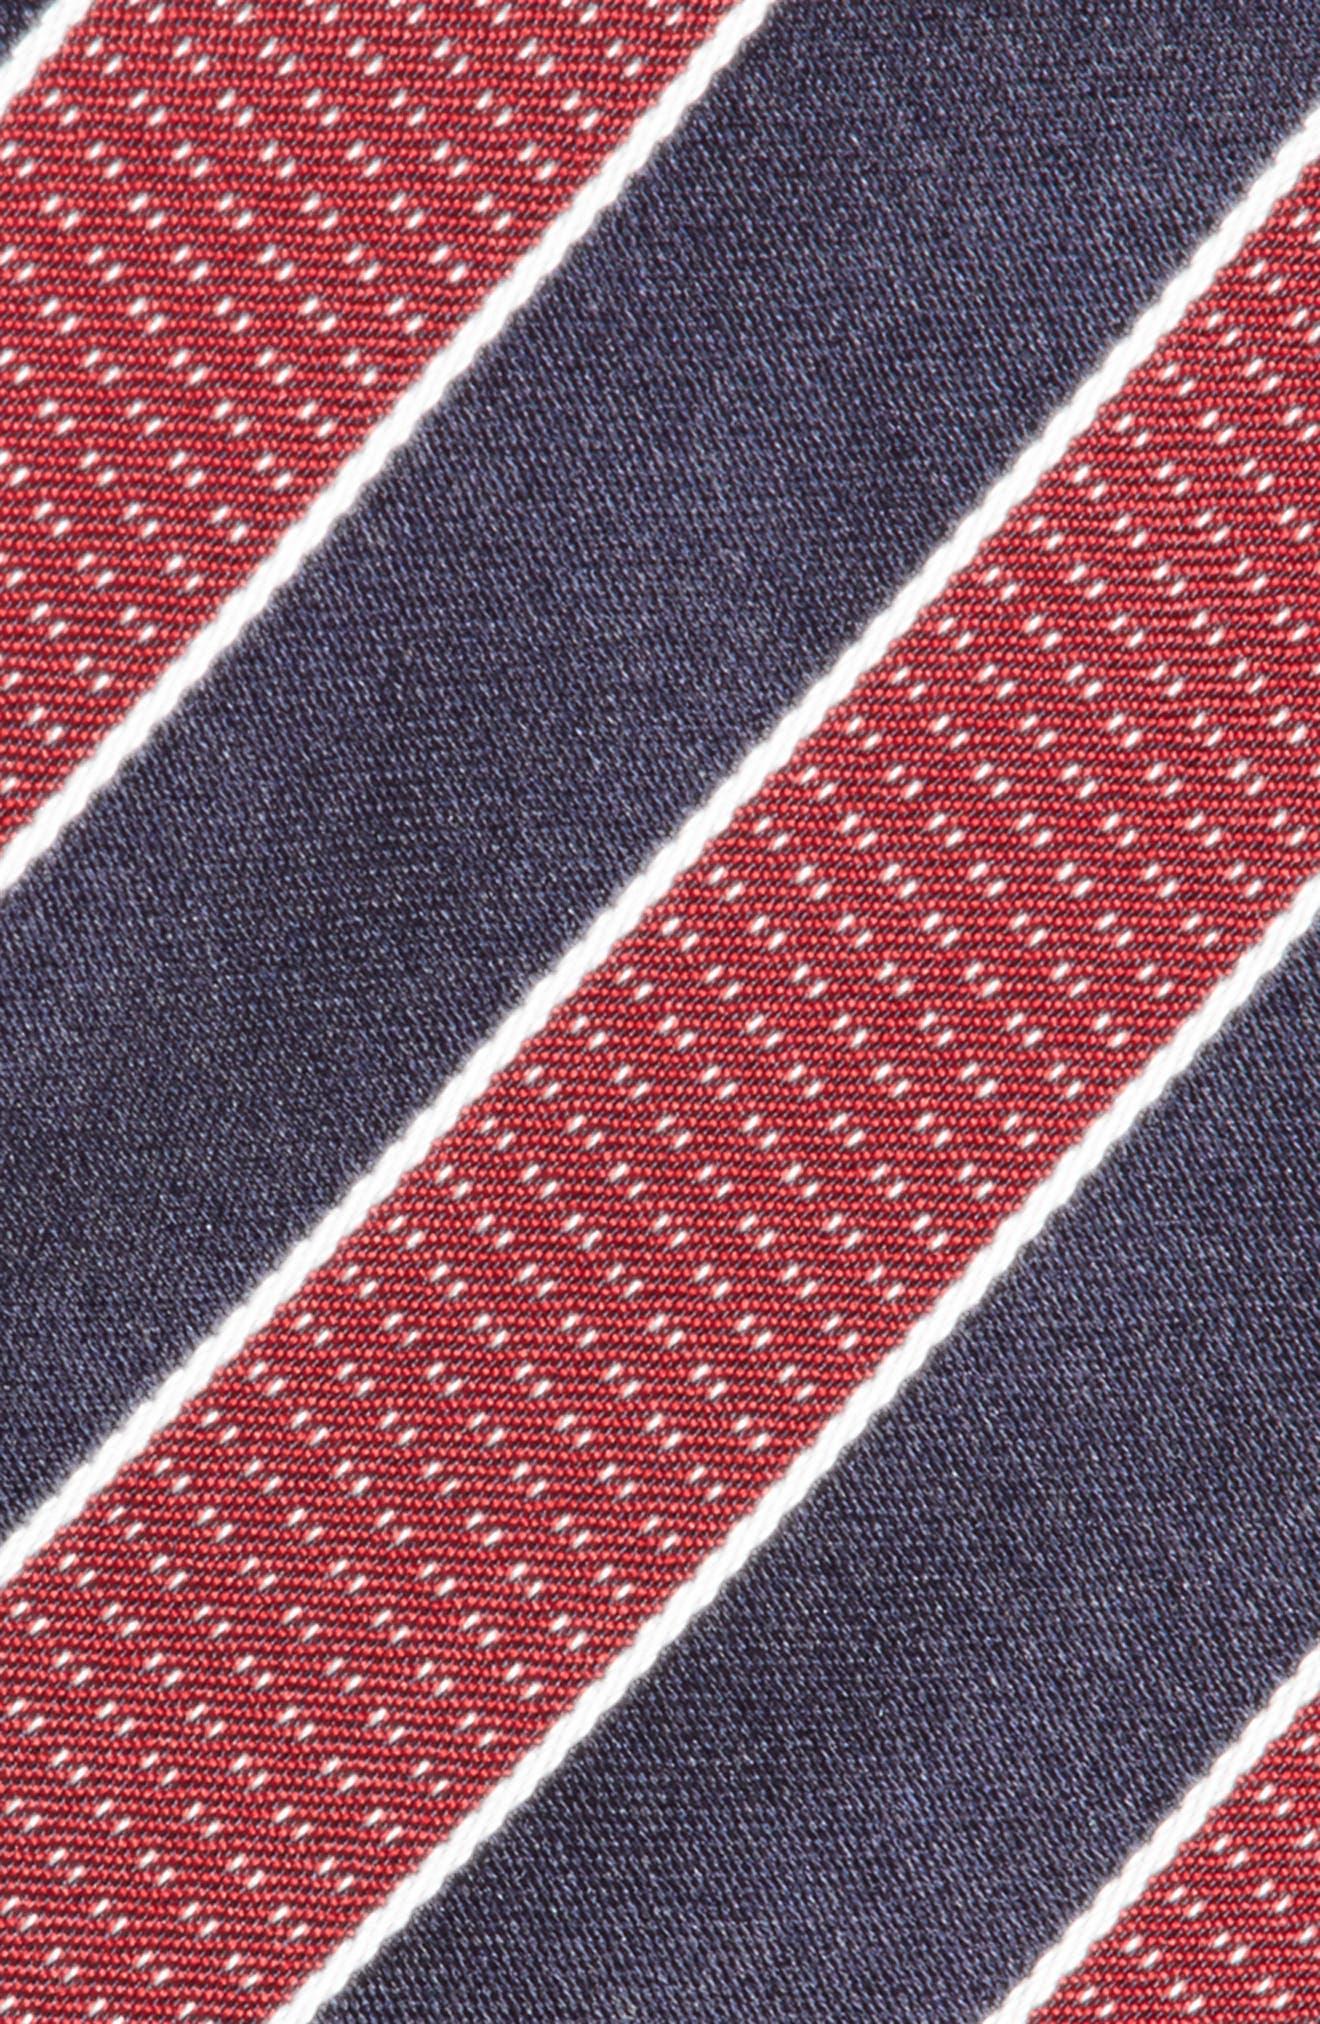 Stripe Silk Tie,                             Alternate thumbnail 2, color,                             Medium Red